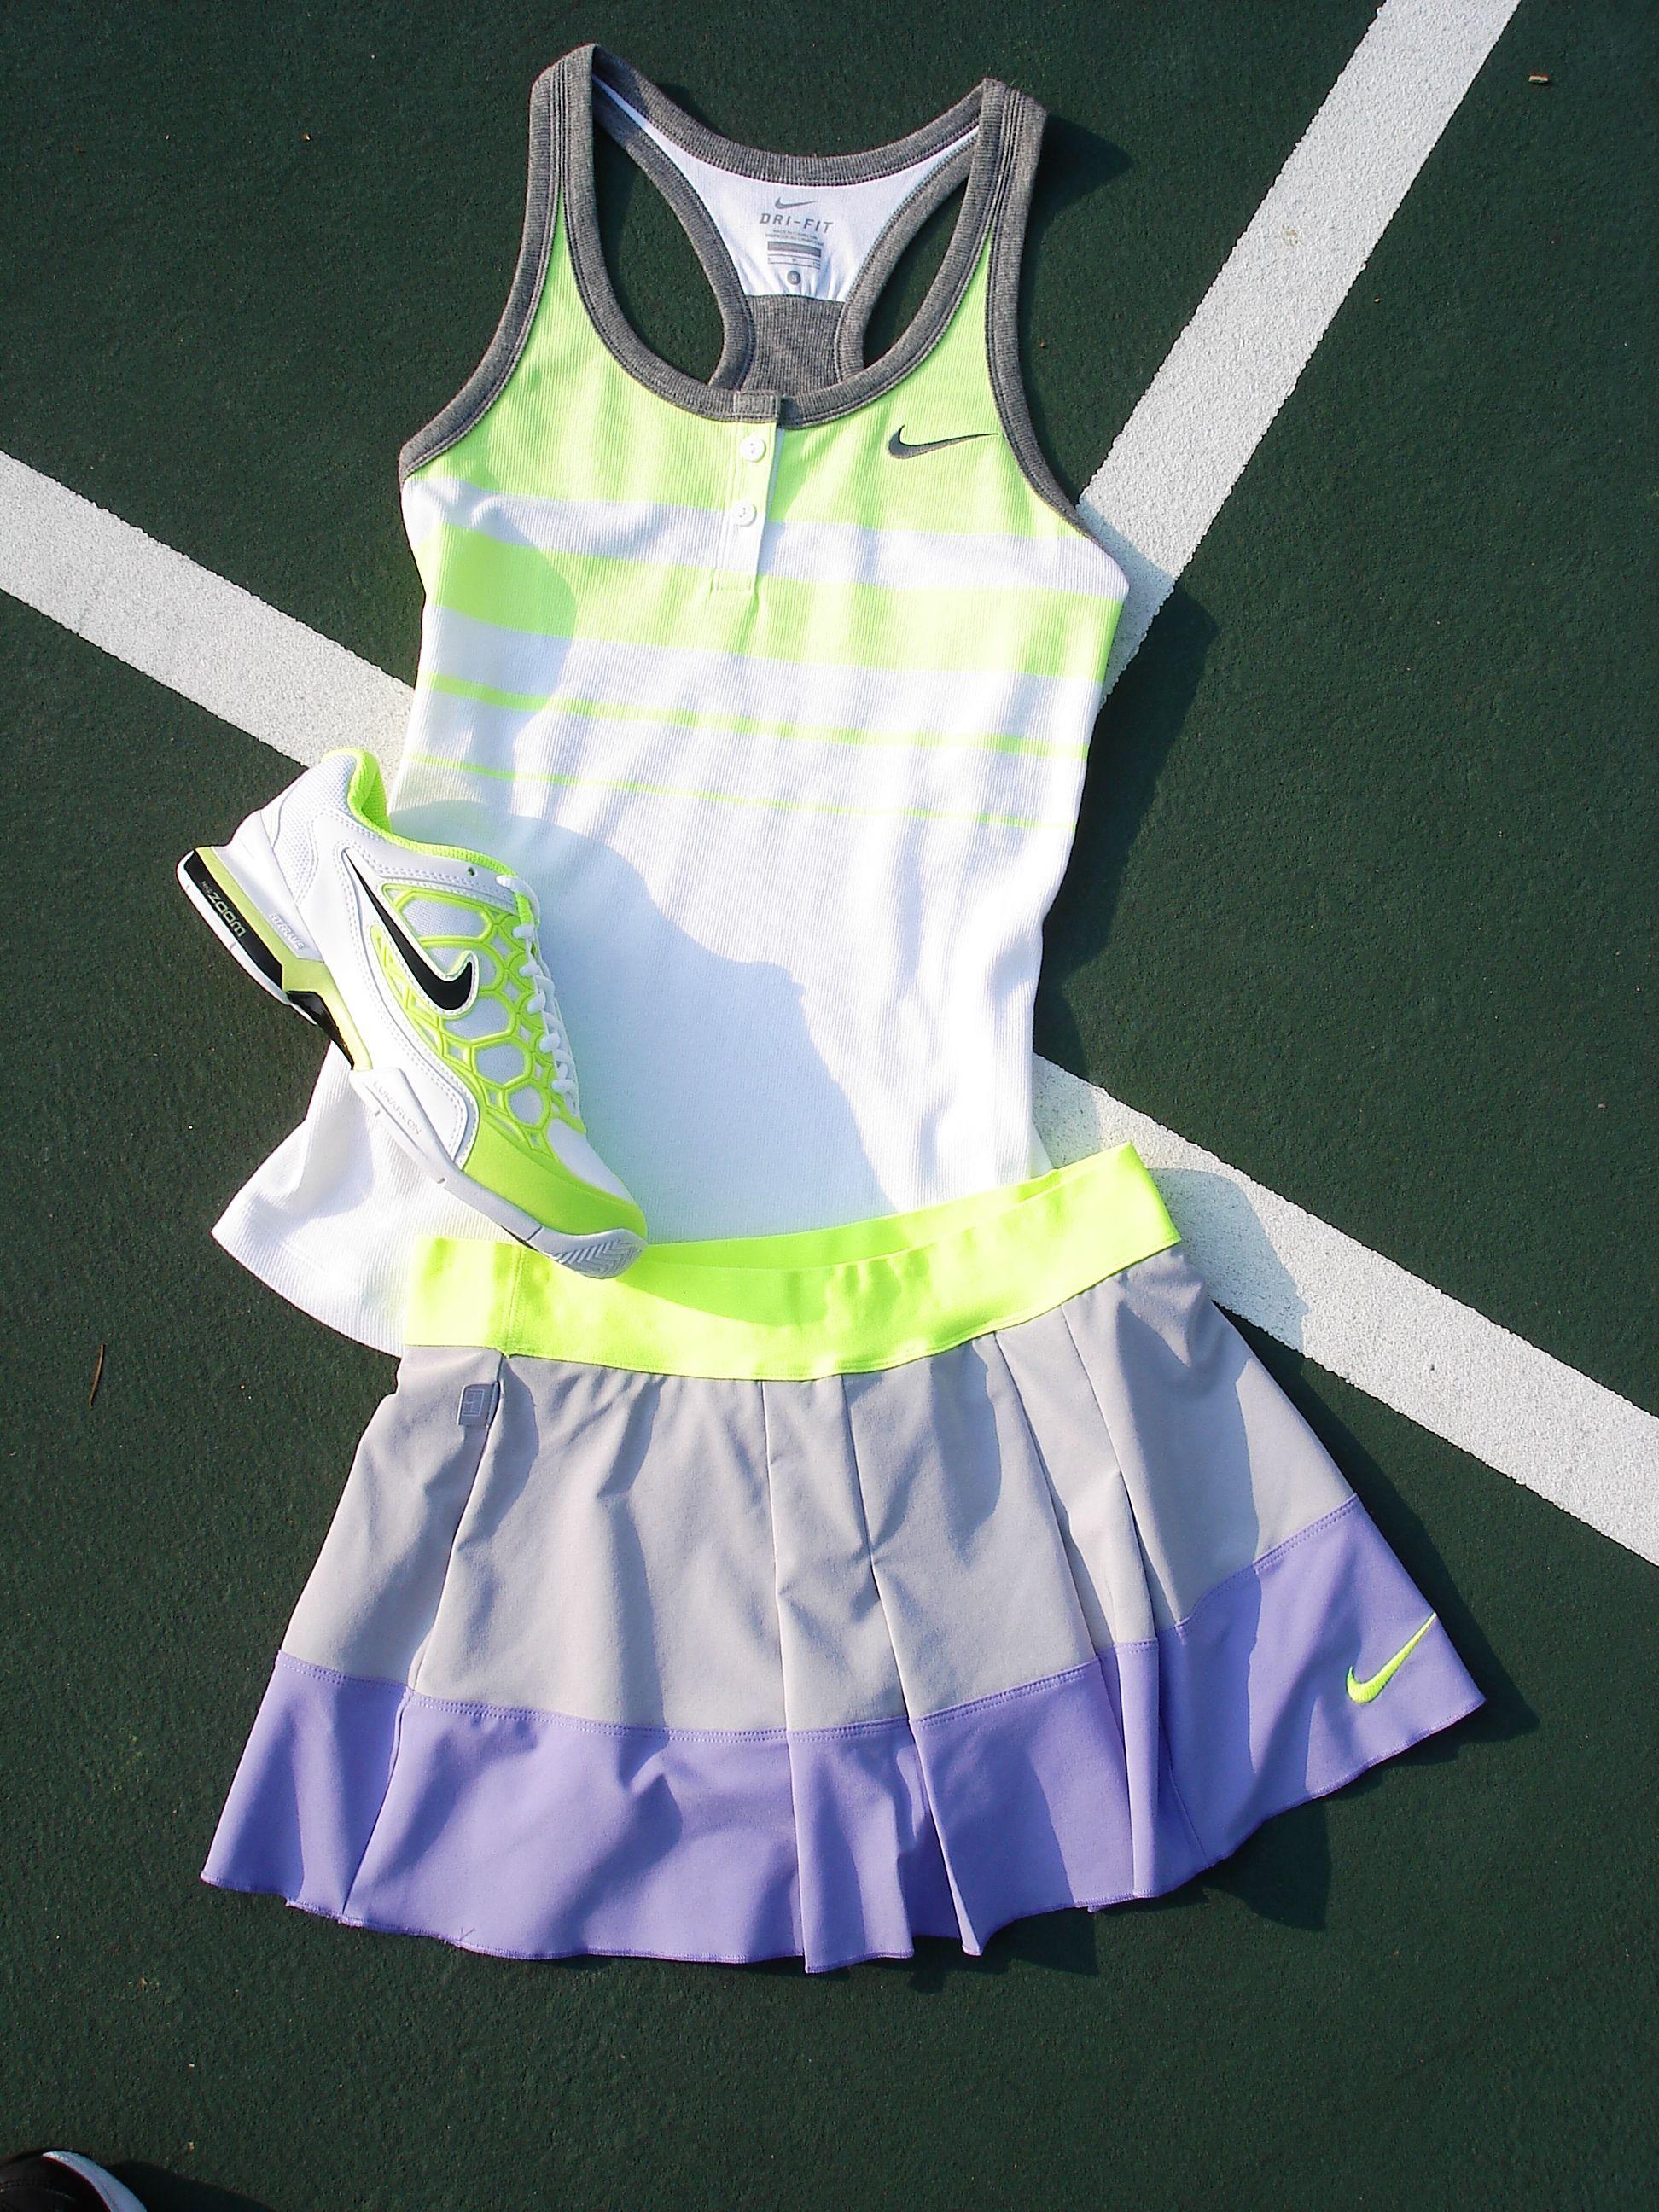 Nike Womens Tennis Apparel Women S Tennis Tennis Outfit Women Tennis Clothes Tennis Wear